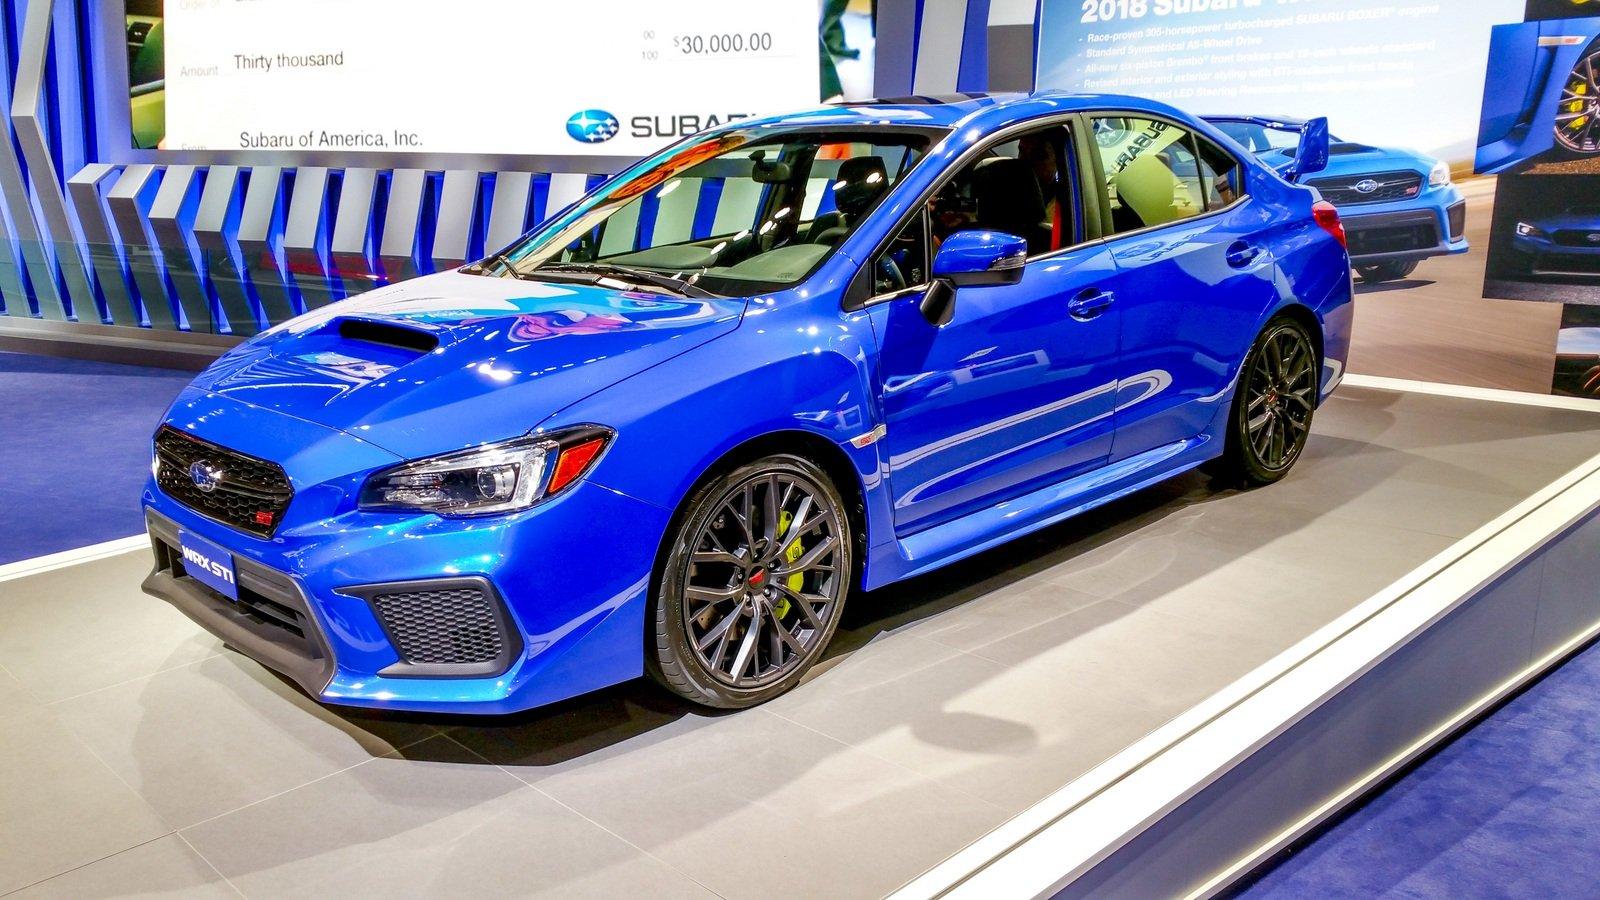 The Subaru WRX STI rules the road